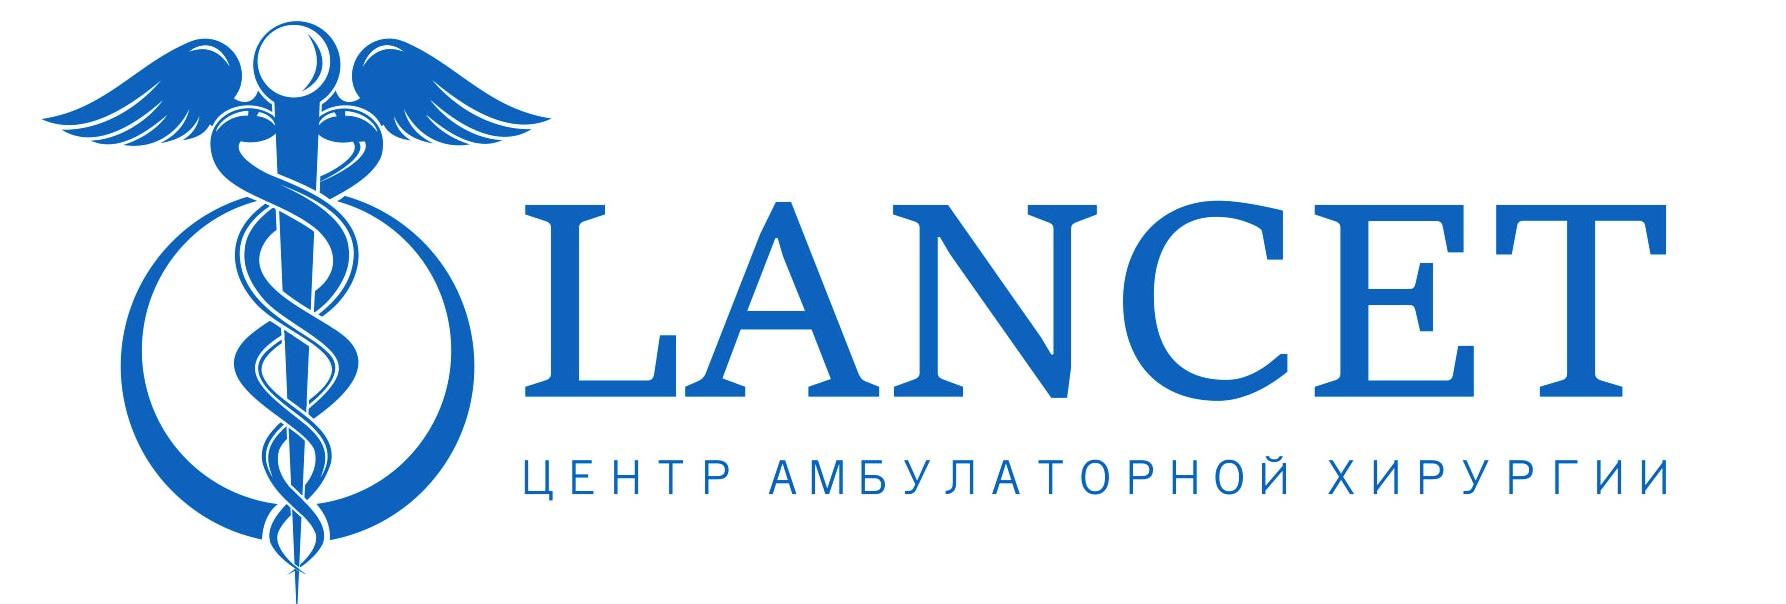 Логотип клиники Лансет